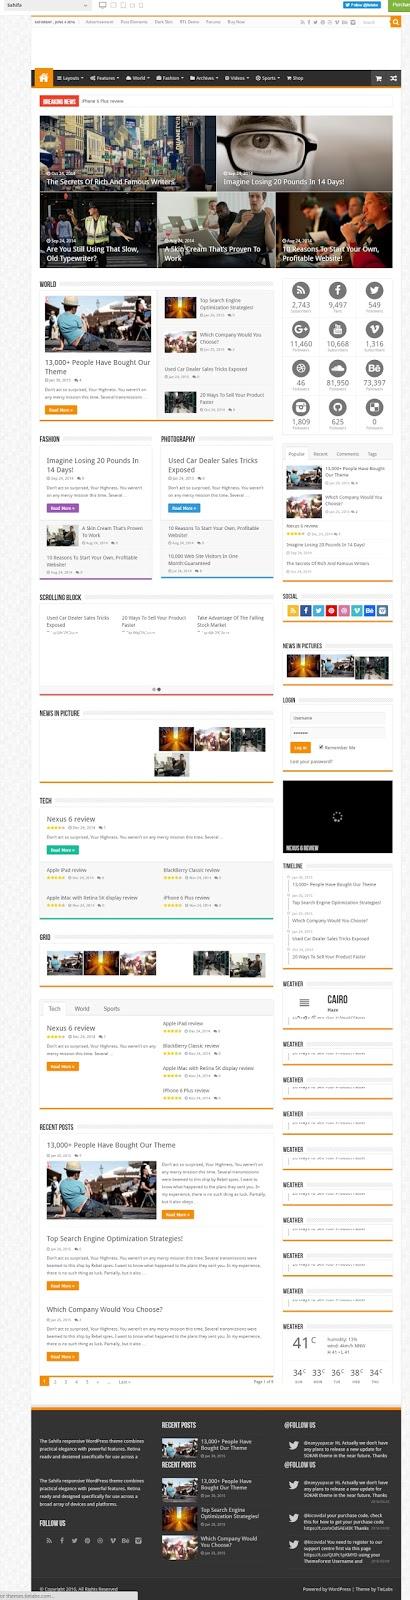 Sahifa- Premium wordpress News theme